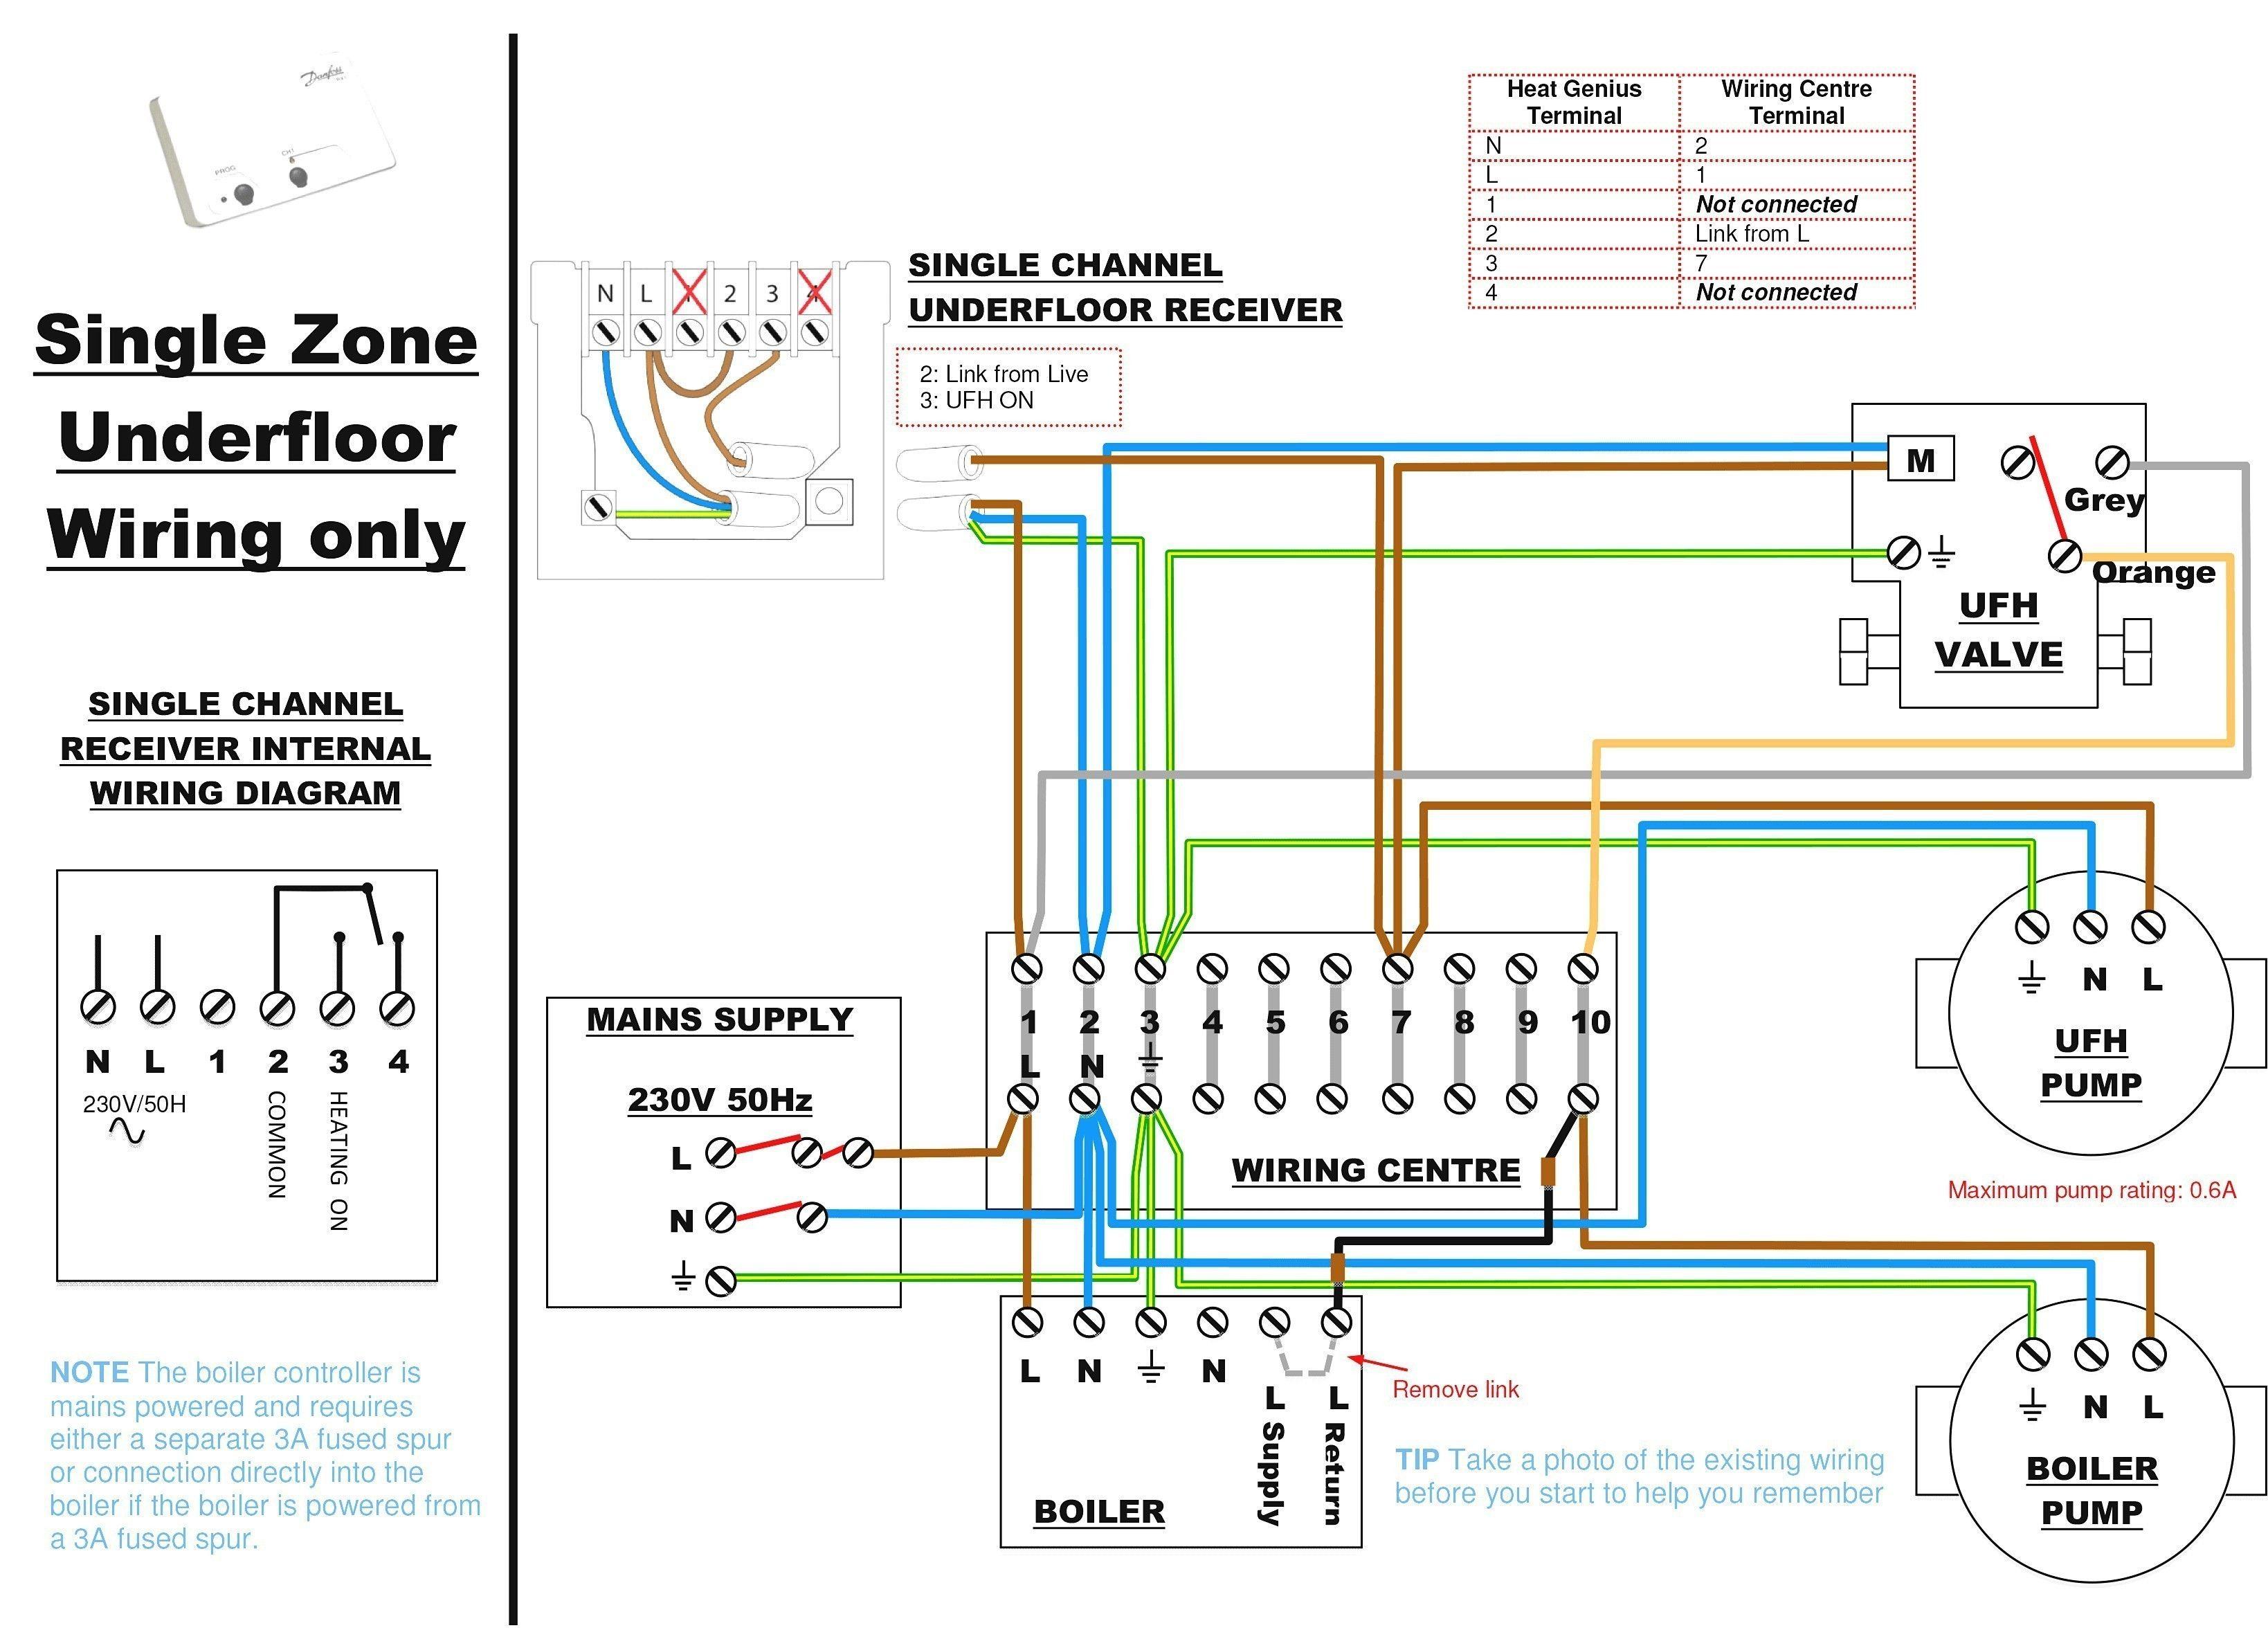 New Wiring Diagram for Combination Boiler (con imágenes